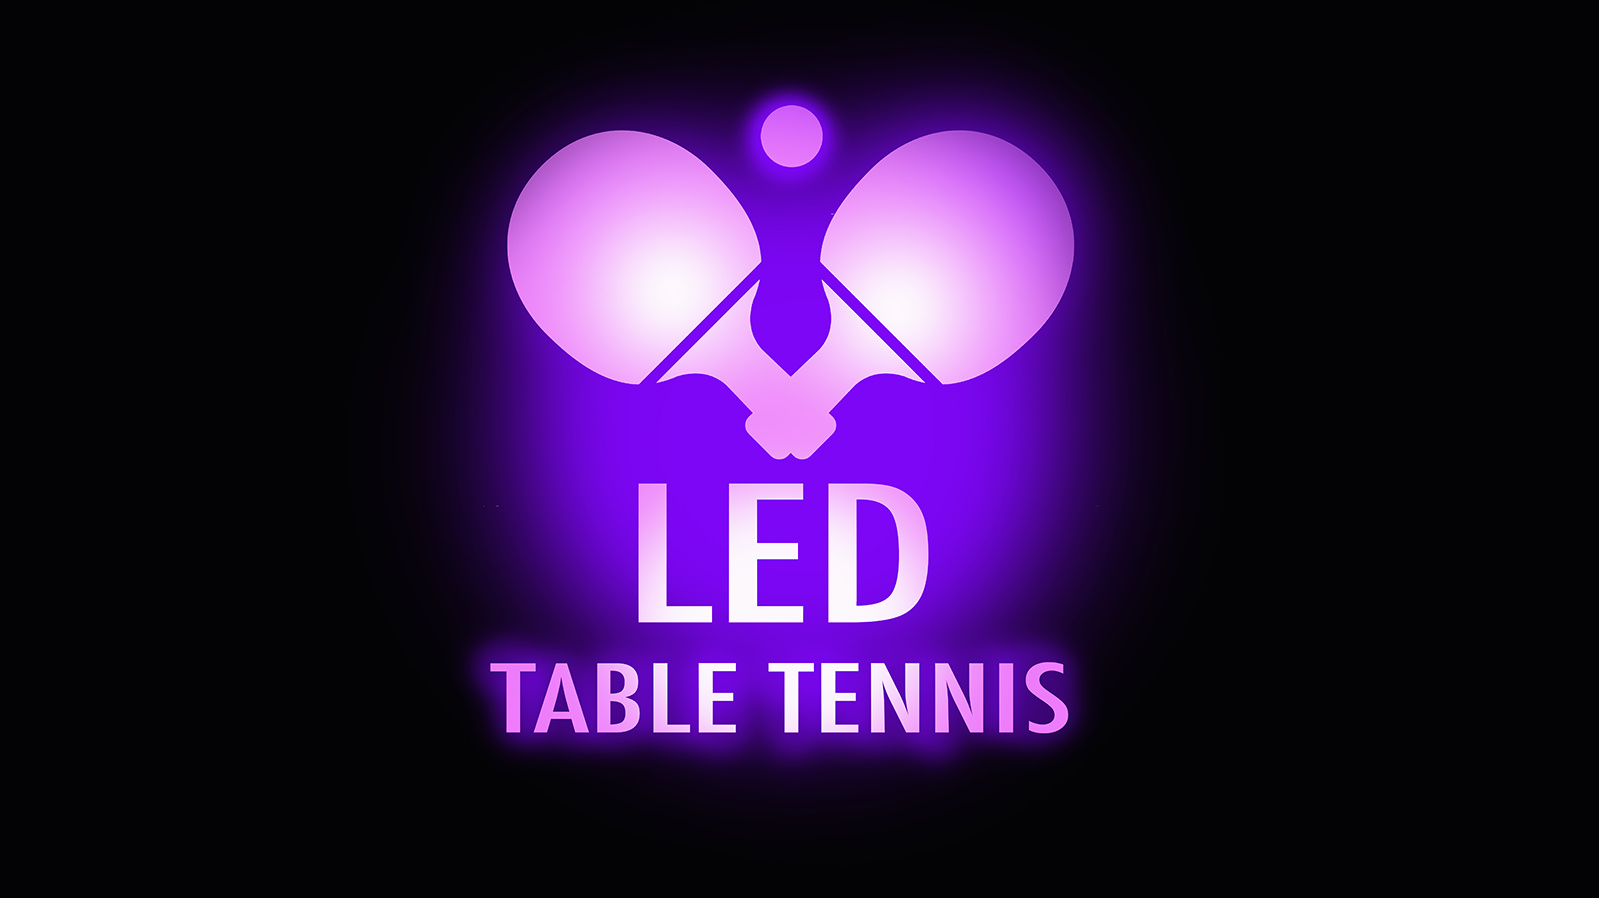 LED Table Tennis